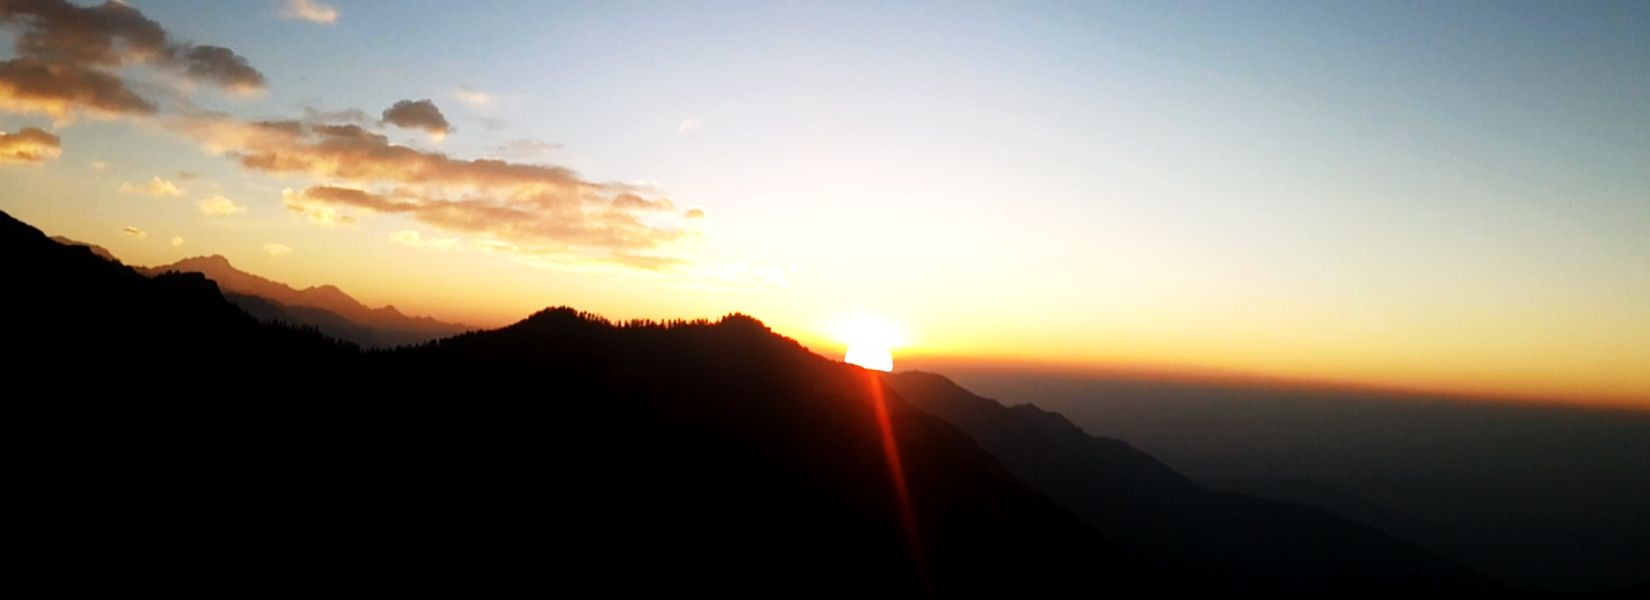 Nagarkot Sunrise, Nagarkot Sunrise Tour, Nepal Sunrise, Nepal Sunrise Tour, Nagarkot Hilltop Sunrise